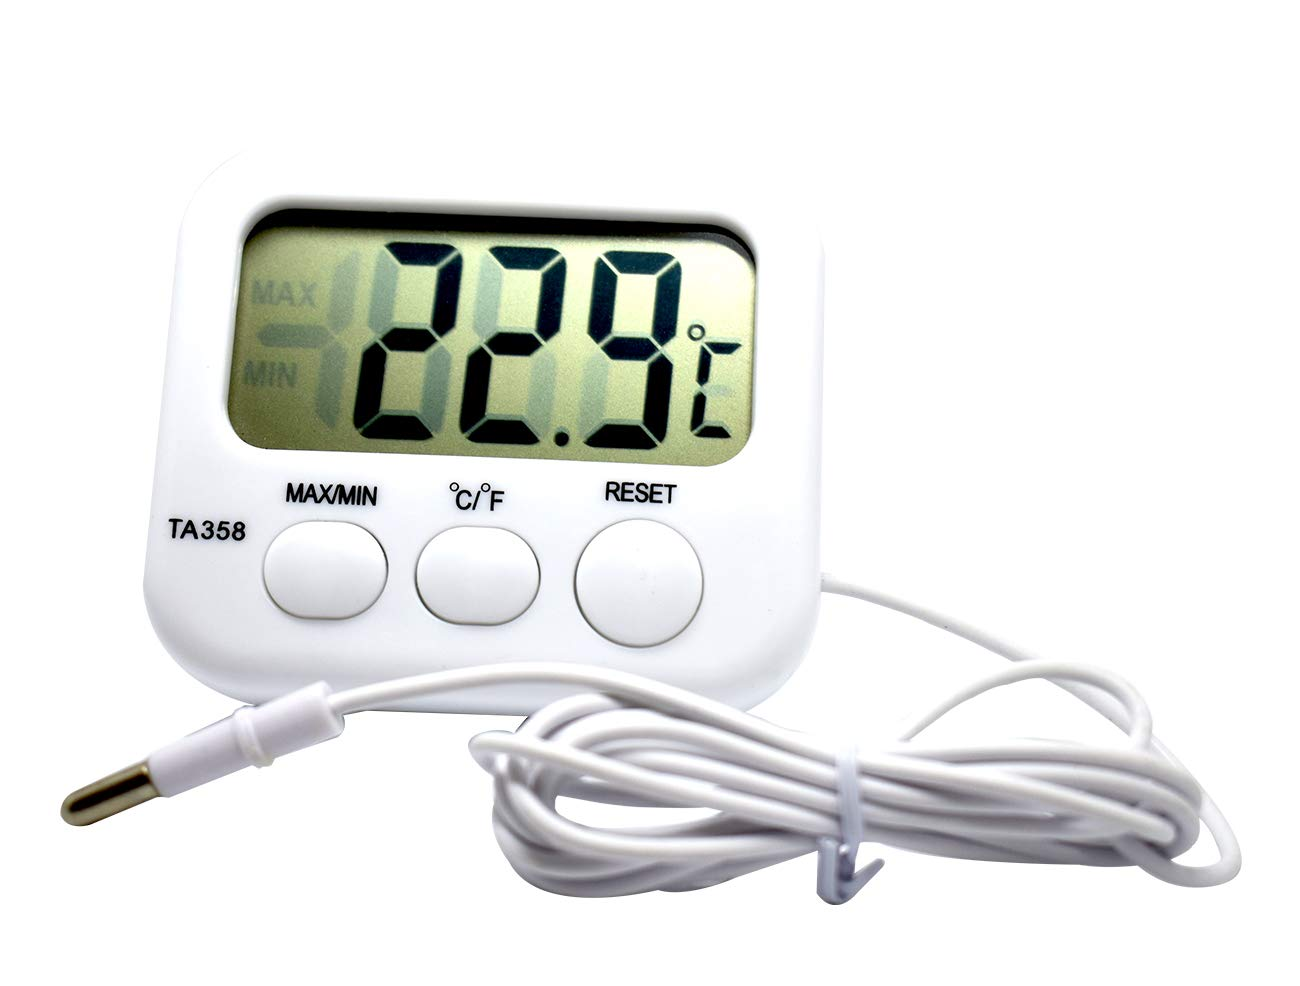 Bytiyar TA358 Celsius/Fahrenheit Digital Thermometer Temperature Meter Gauge with 4.9ft/1.5M Probe Sensor